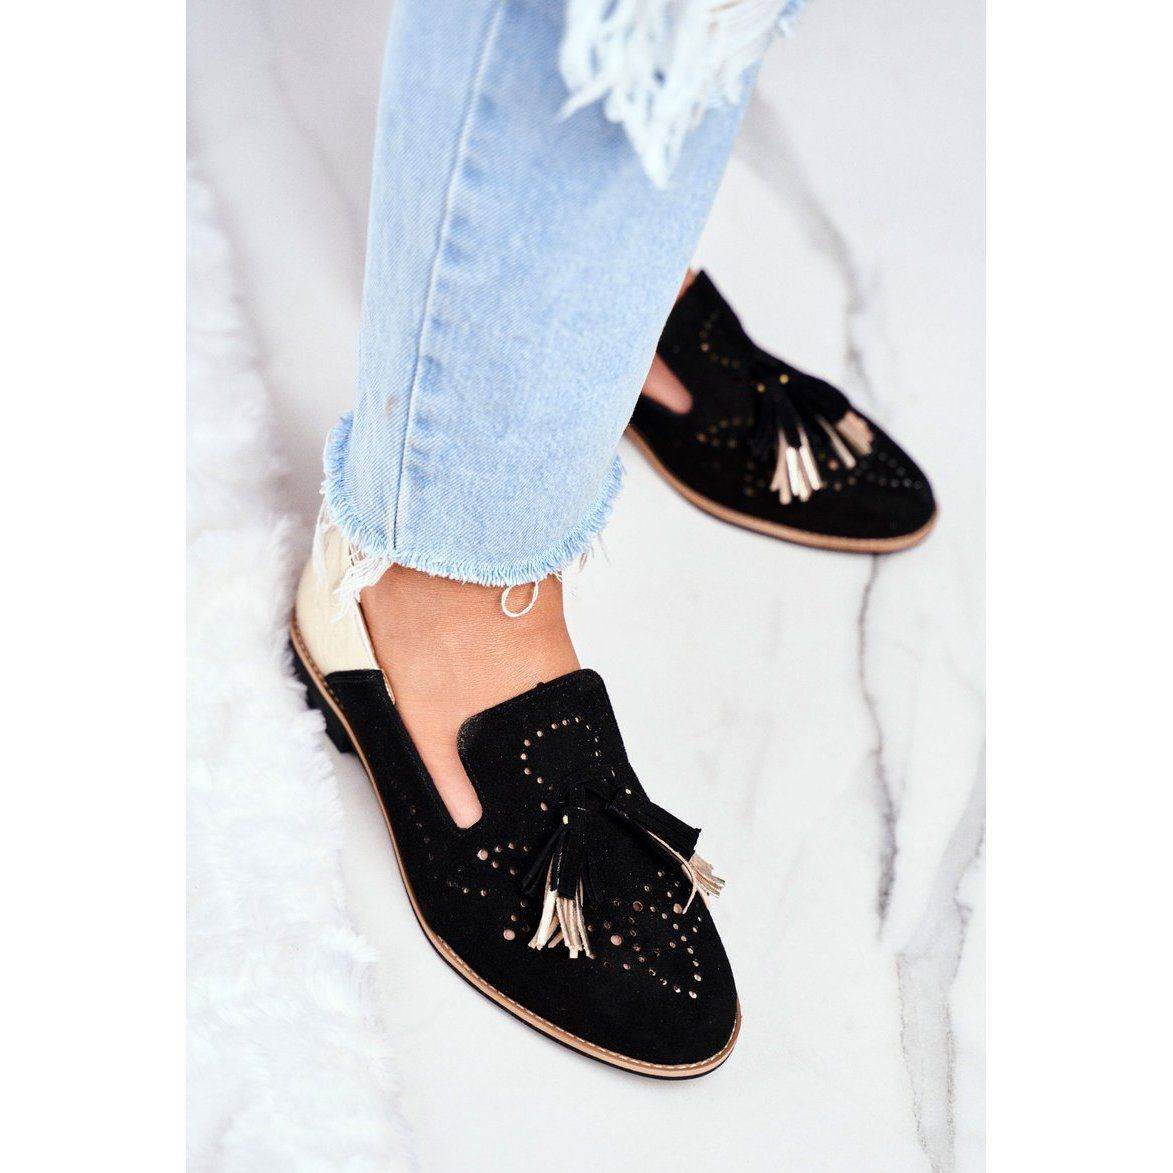 Damskie Polbuty Maciejka Skorzane Mokasyny Czarne 04484 01 00 5 Shoes Mule Shoe Slippers